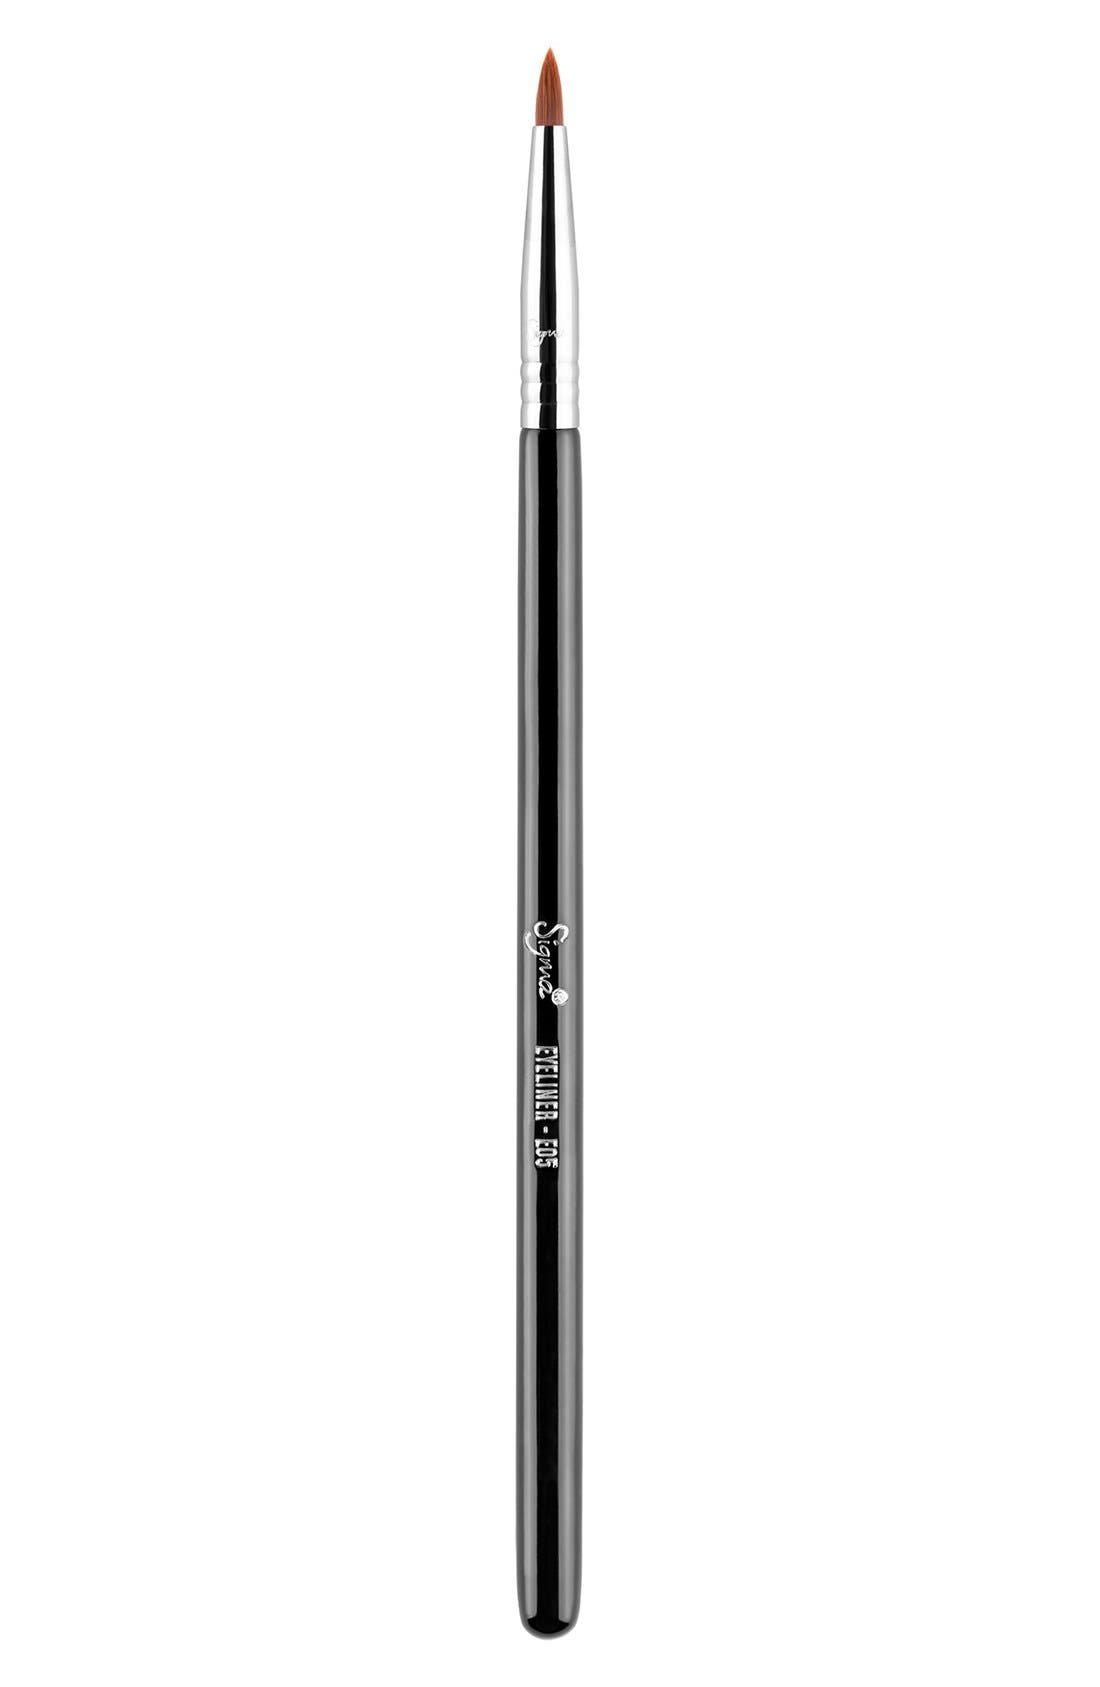 E05 Eyeliner Brush,                             Main thumbnail 1, color,                             NO COLOR